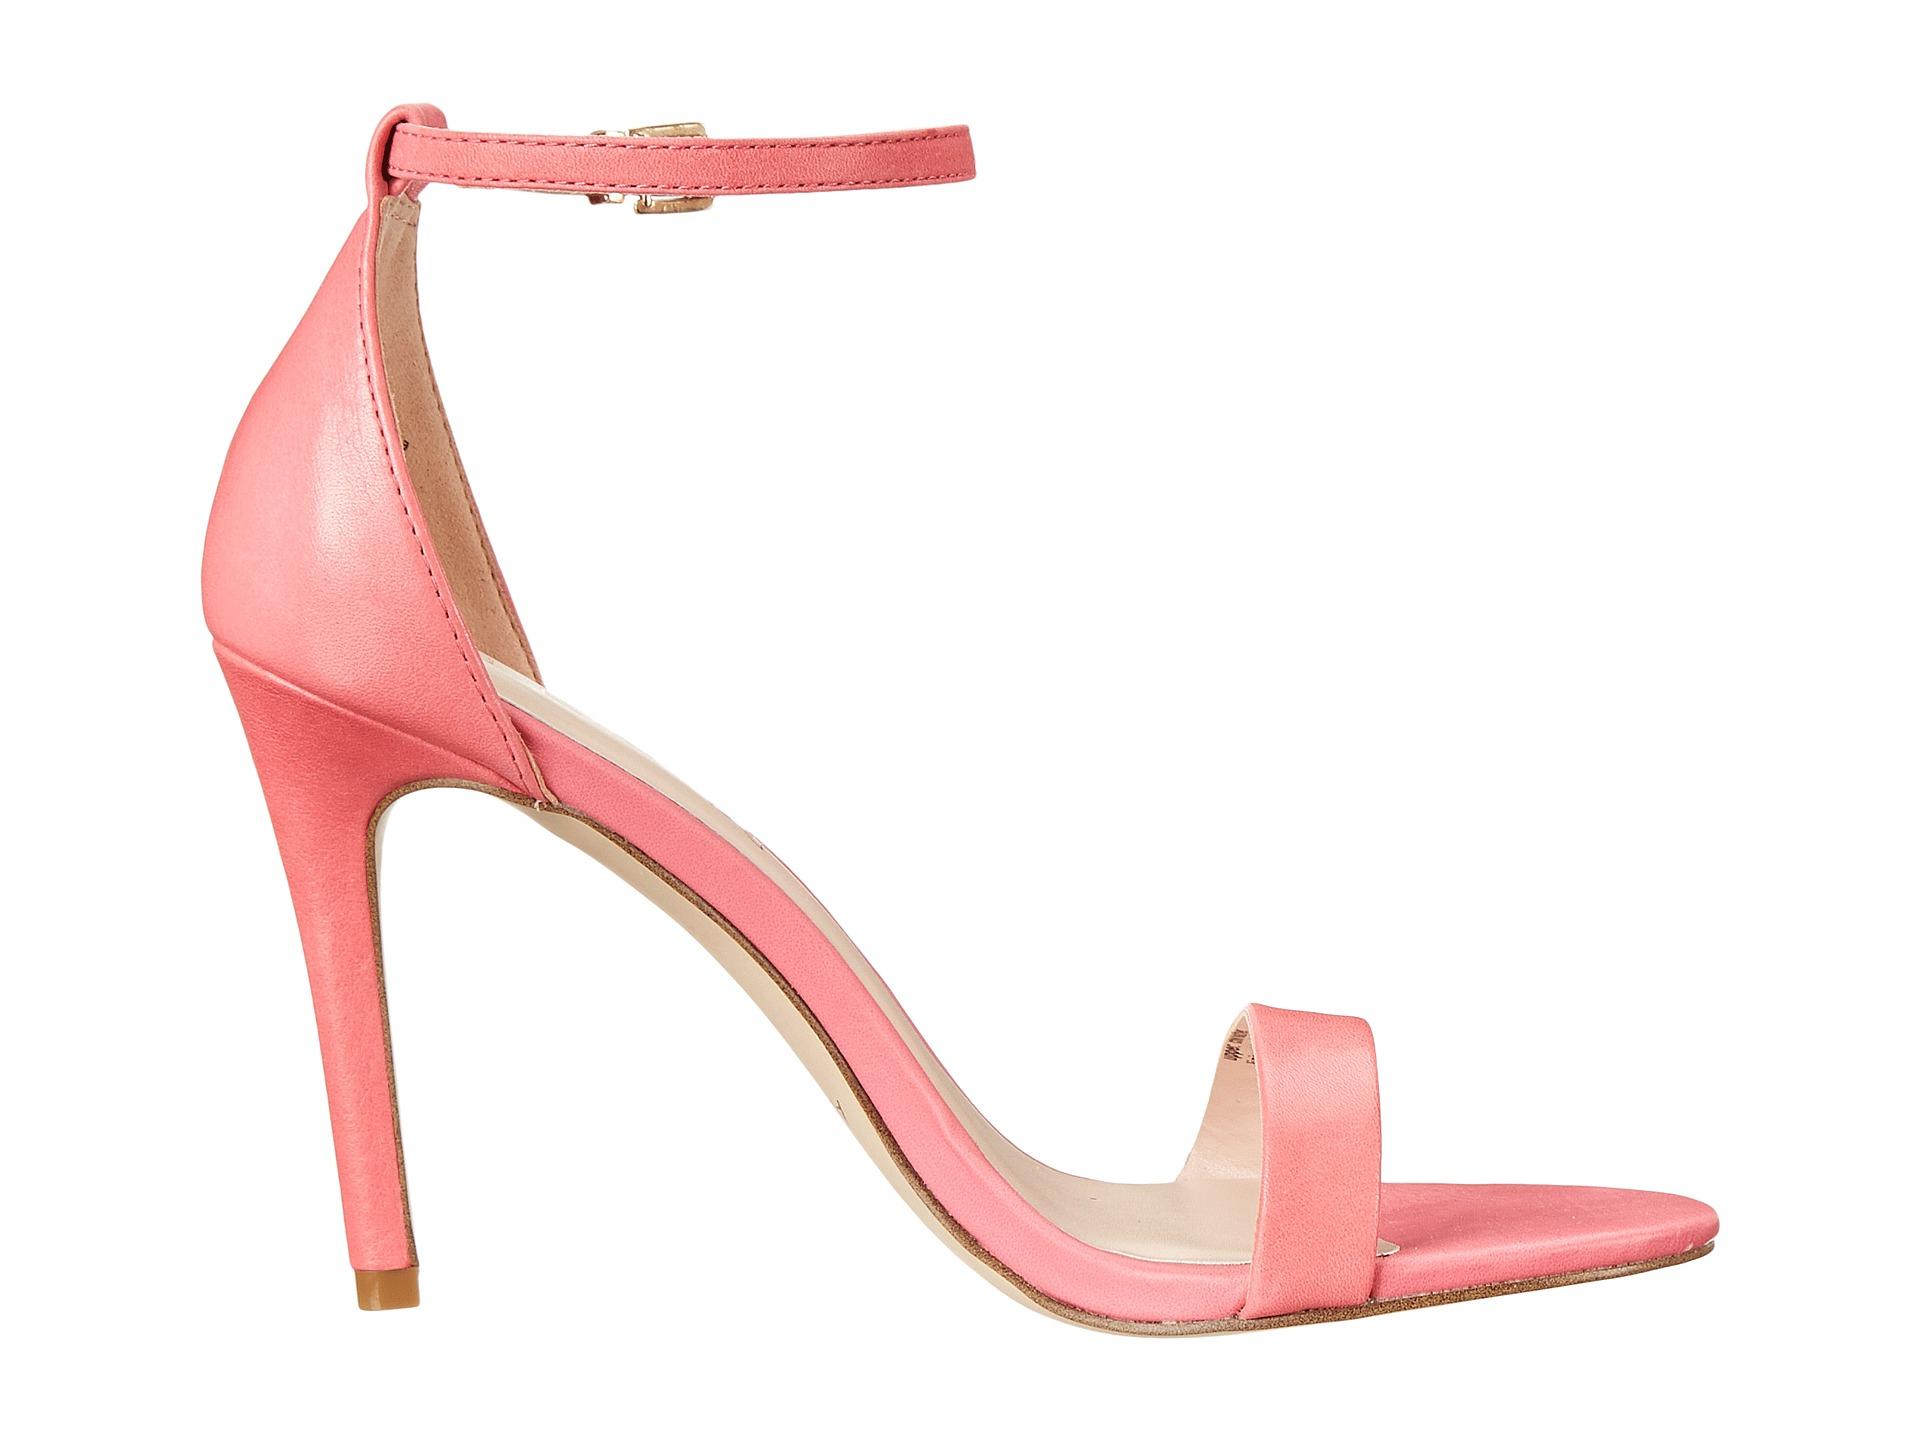 c41c2e46aa3 Lyst - ALDO Paules in Pink